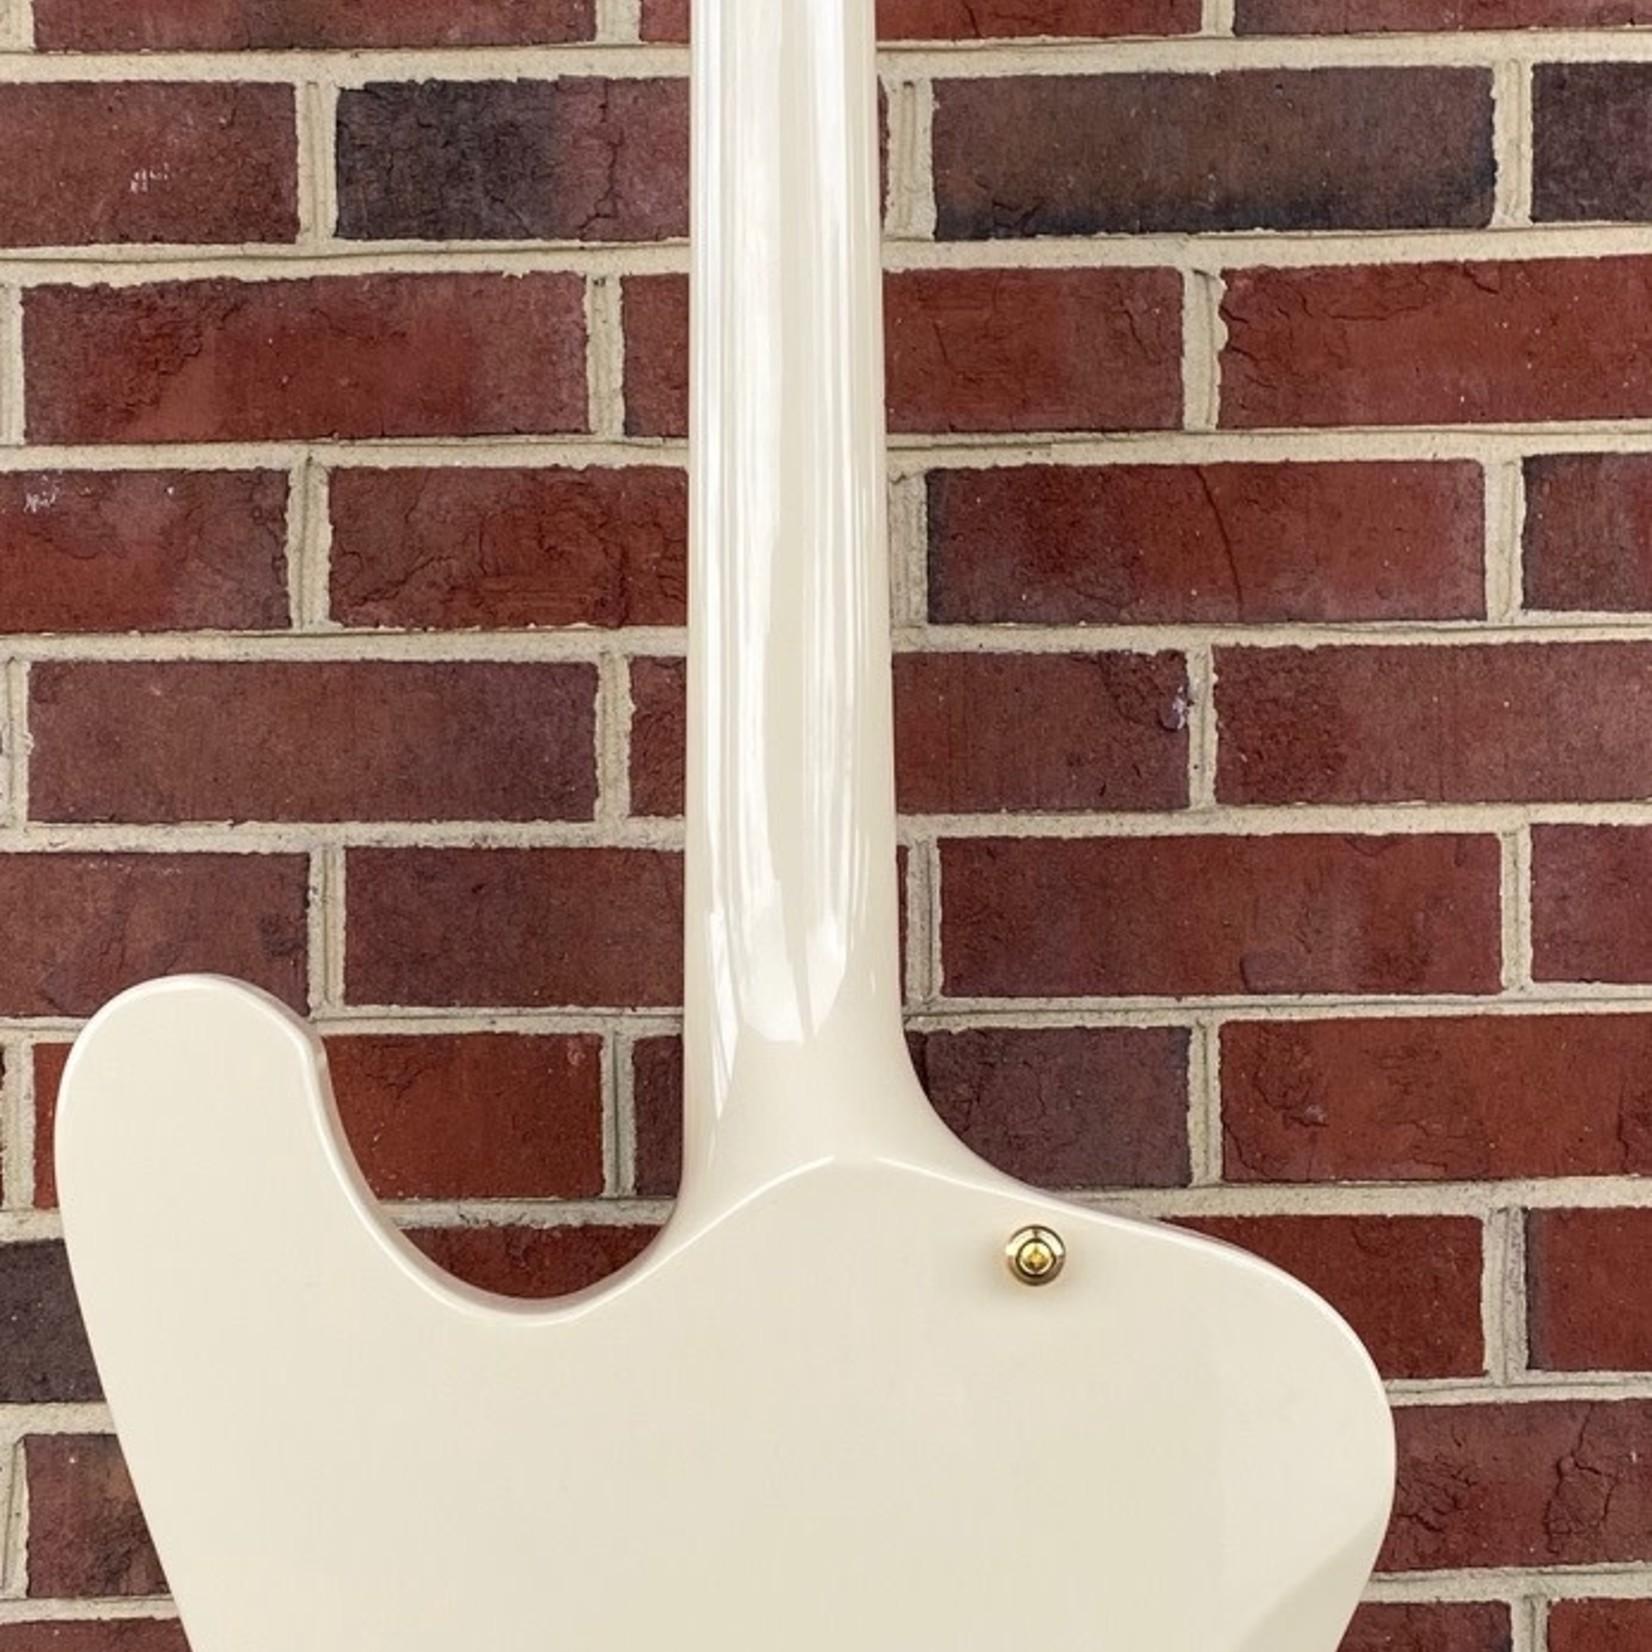 ESP ESP LTD PHOENIX1000VW, Vintage White, Seymour Duncan Custom (bridge), Seymour Duncan Phat Cat (neck), Macassar Ebony FB, Bone Nut, Gold Hardware